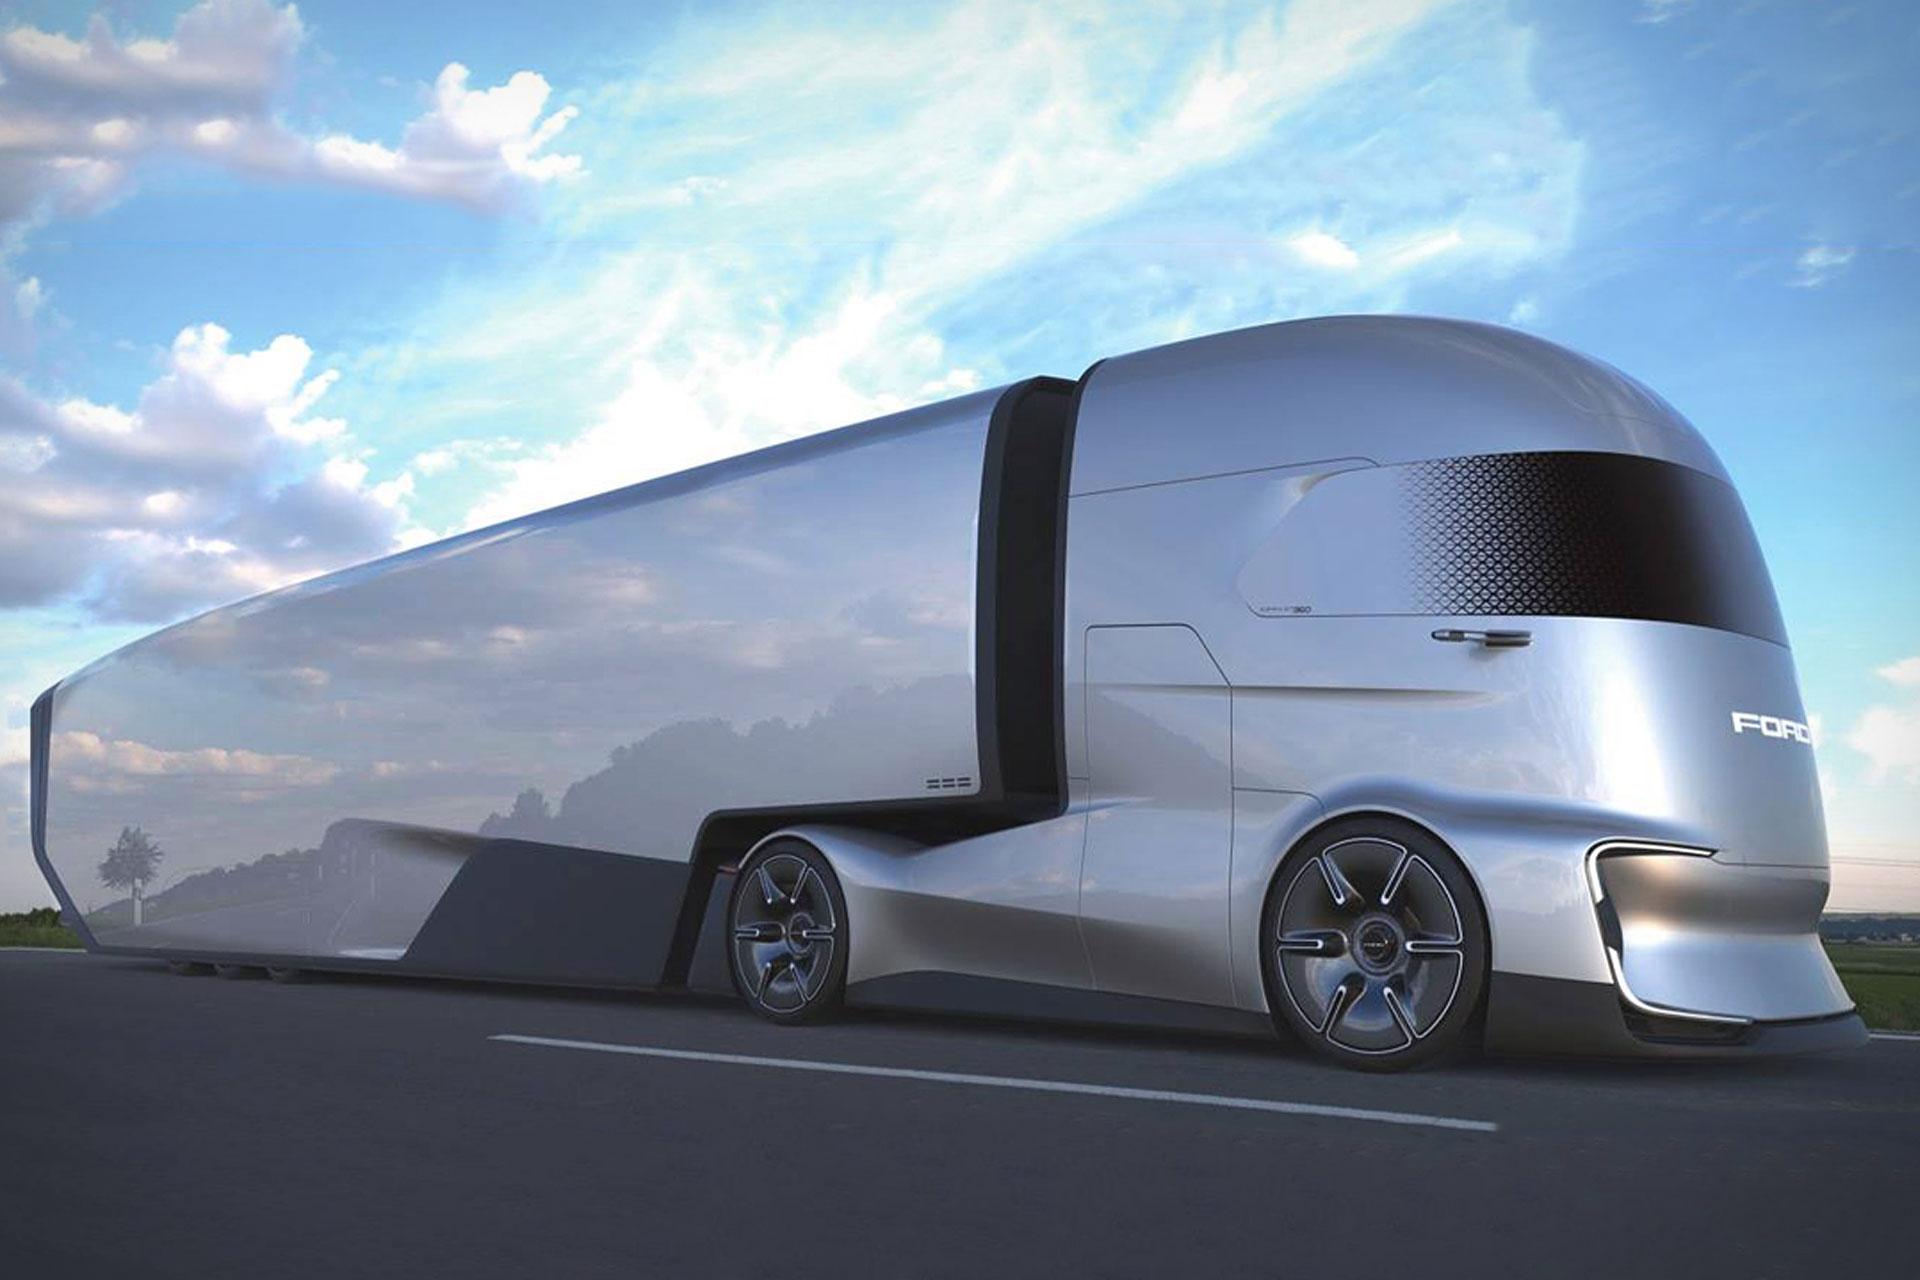 Heavy Duty Trucks >> Ford F-Vision Semi Truck Concept | Uncrate